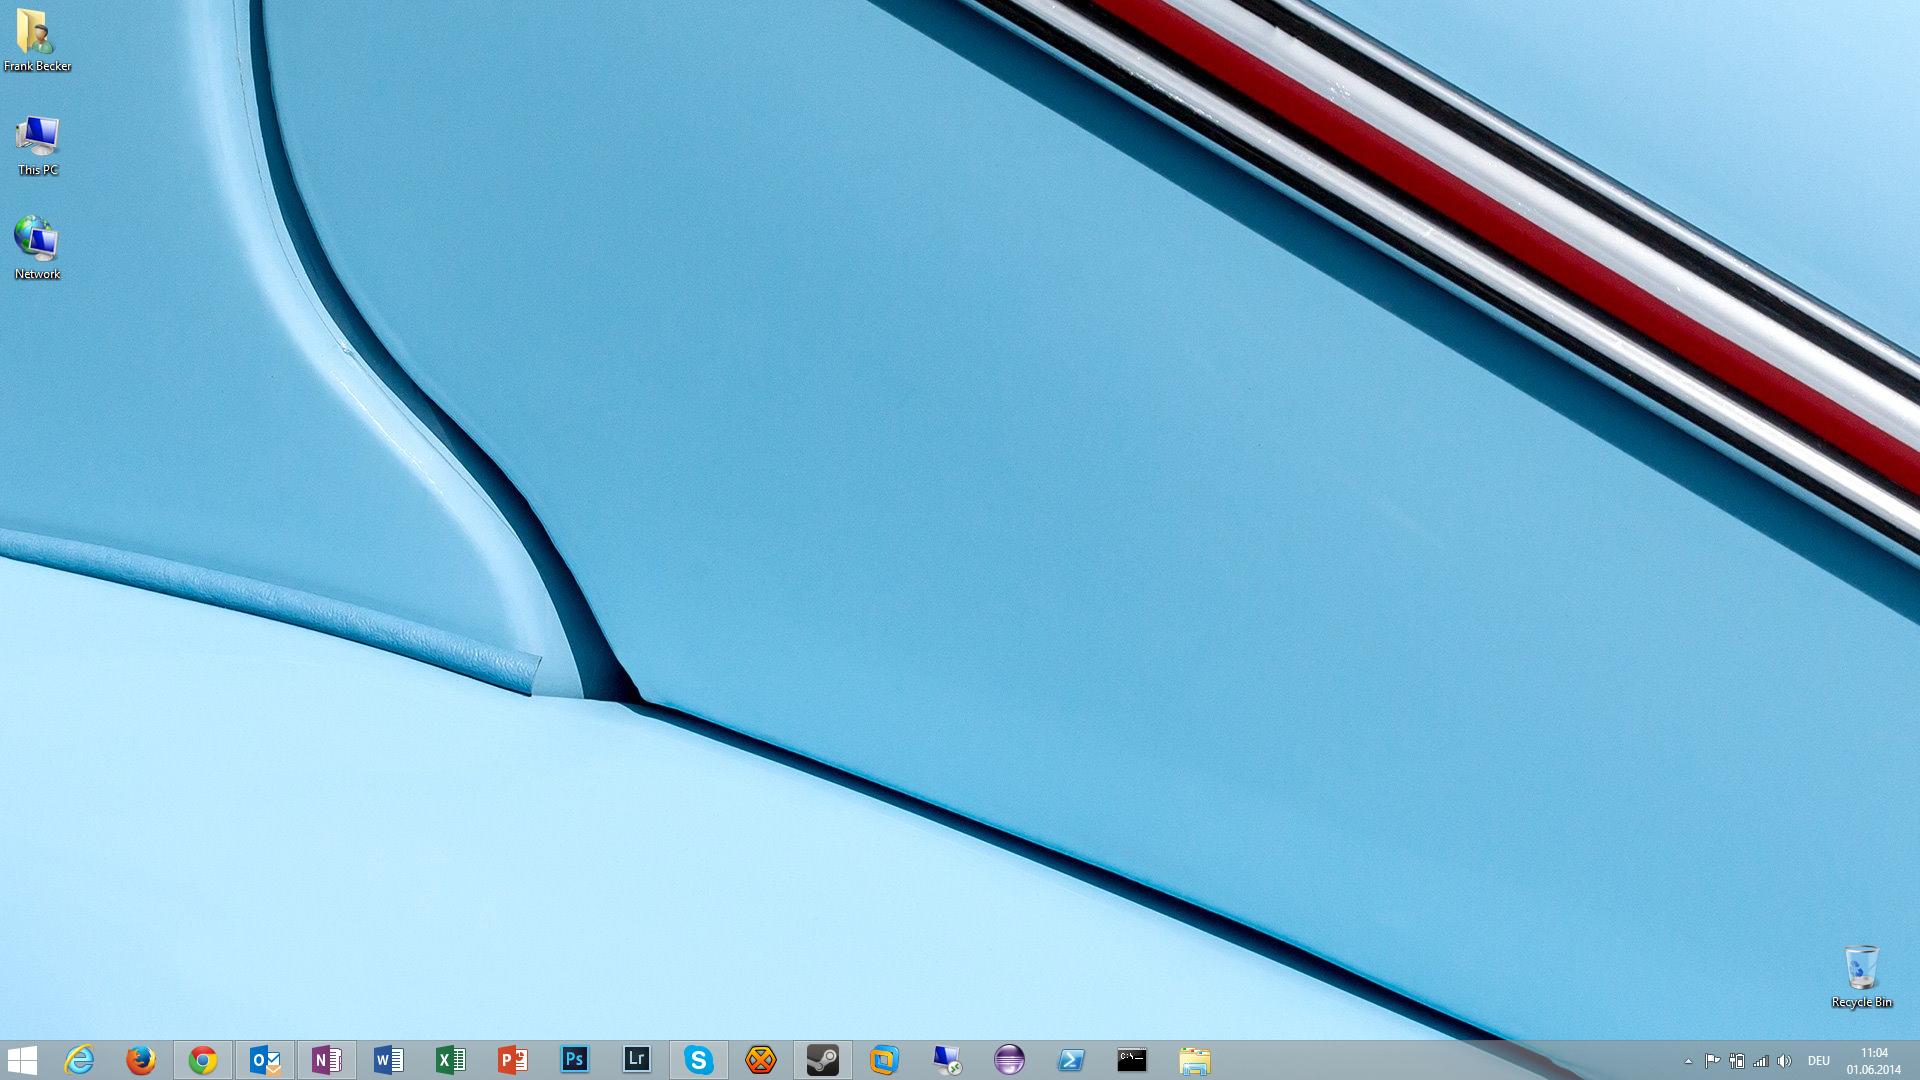 Desktop-June-1-2014.png